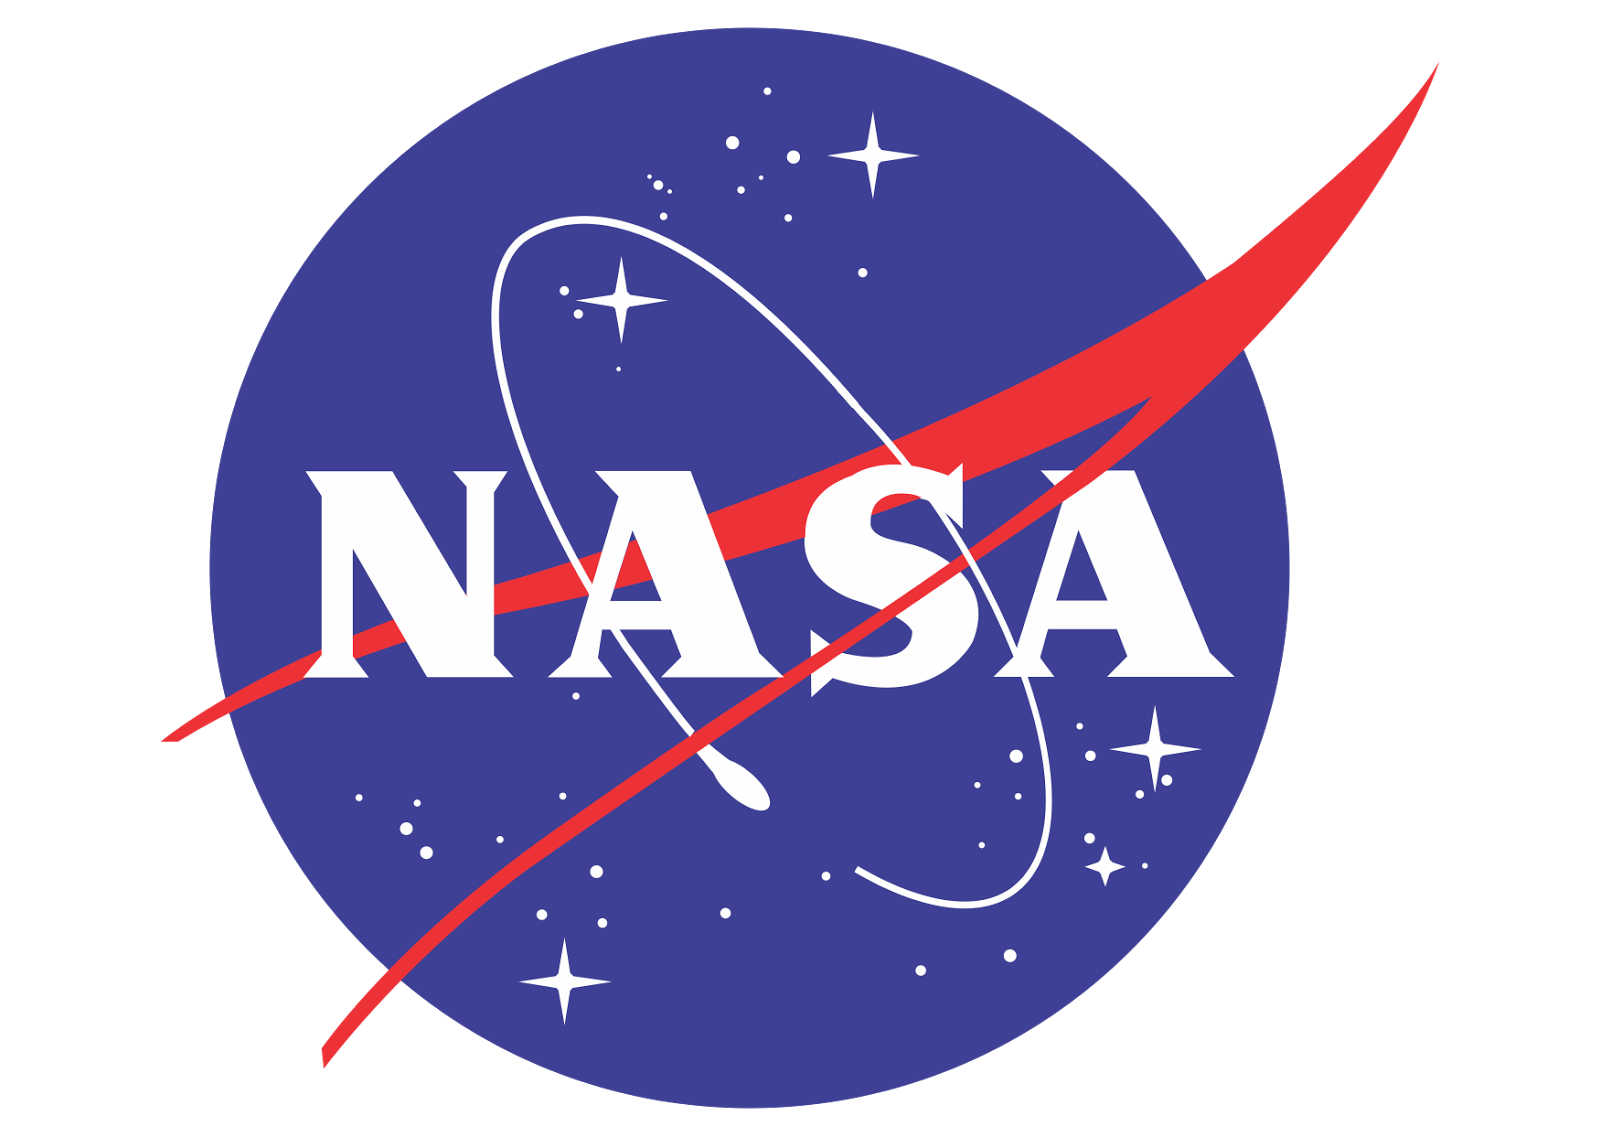 Nasa Logo Images - Reverse Search